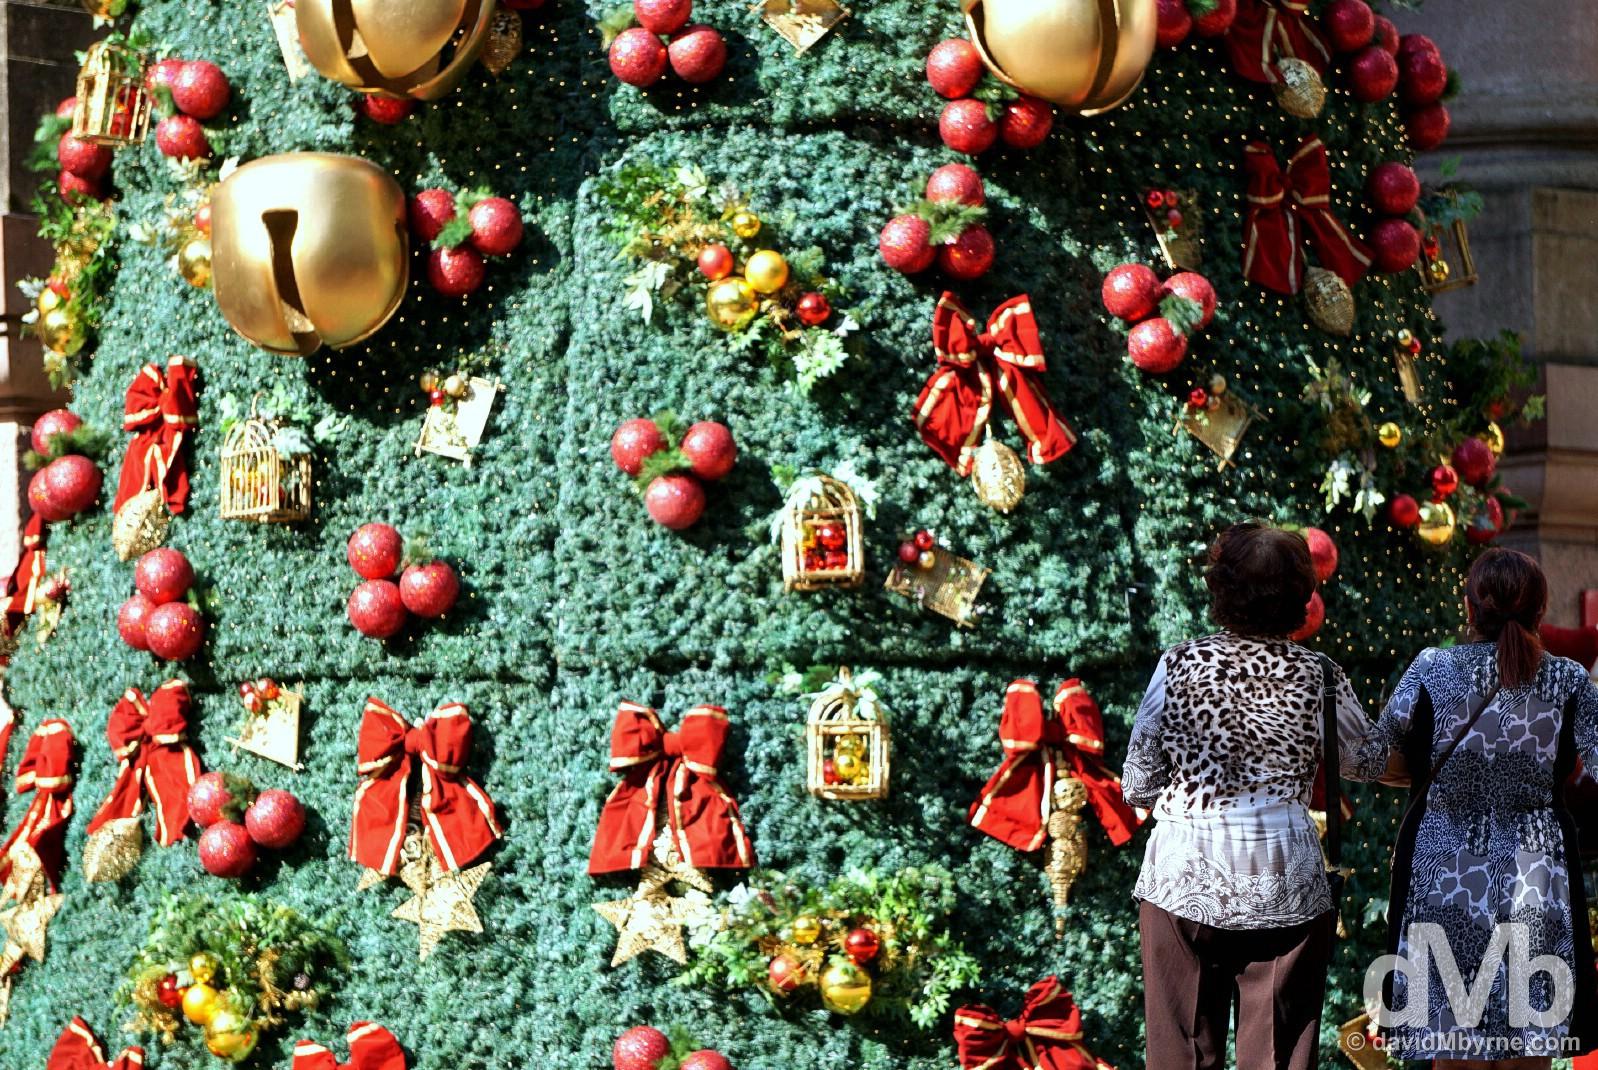 Admiring the massive Christmas tree in Alfandega Square in central Porto Alegre, Brazil. December 8, 2015.